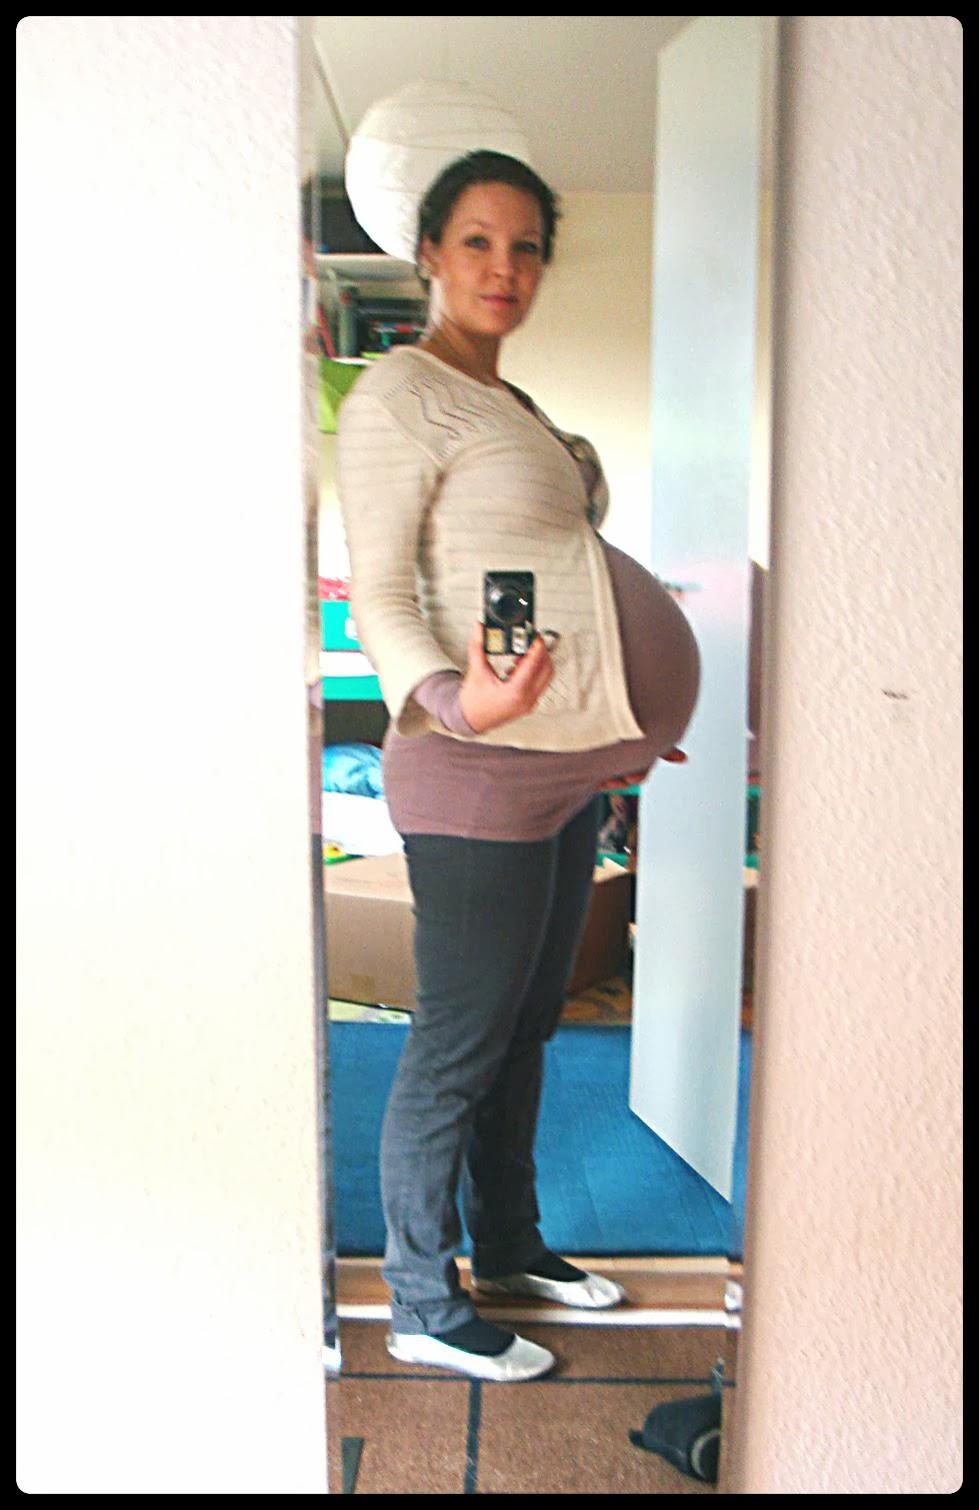 klare mål gravid trods menstruation